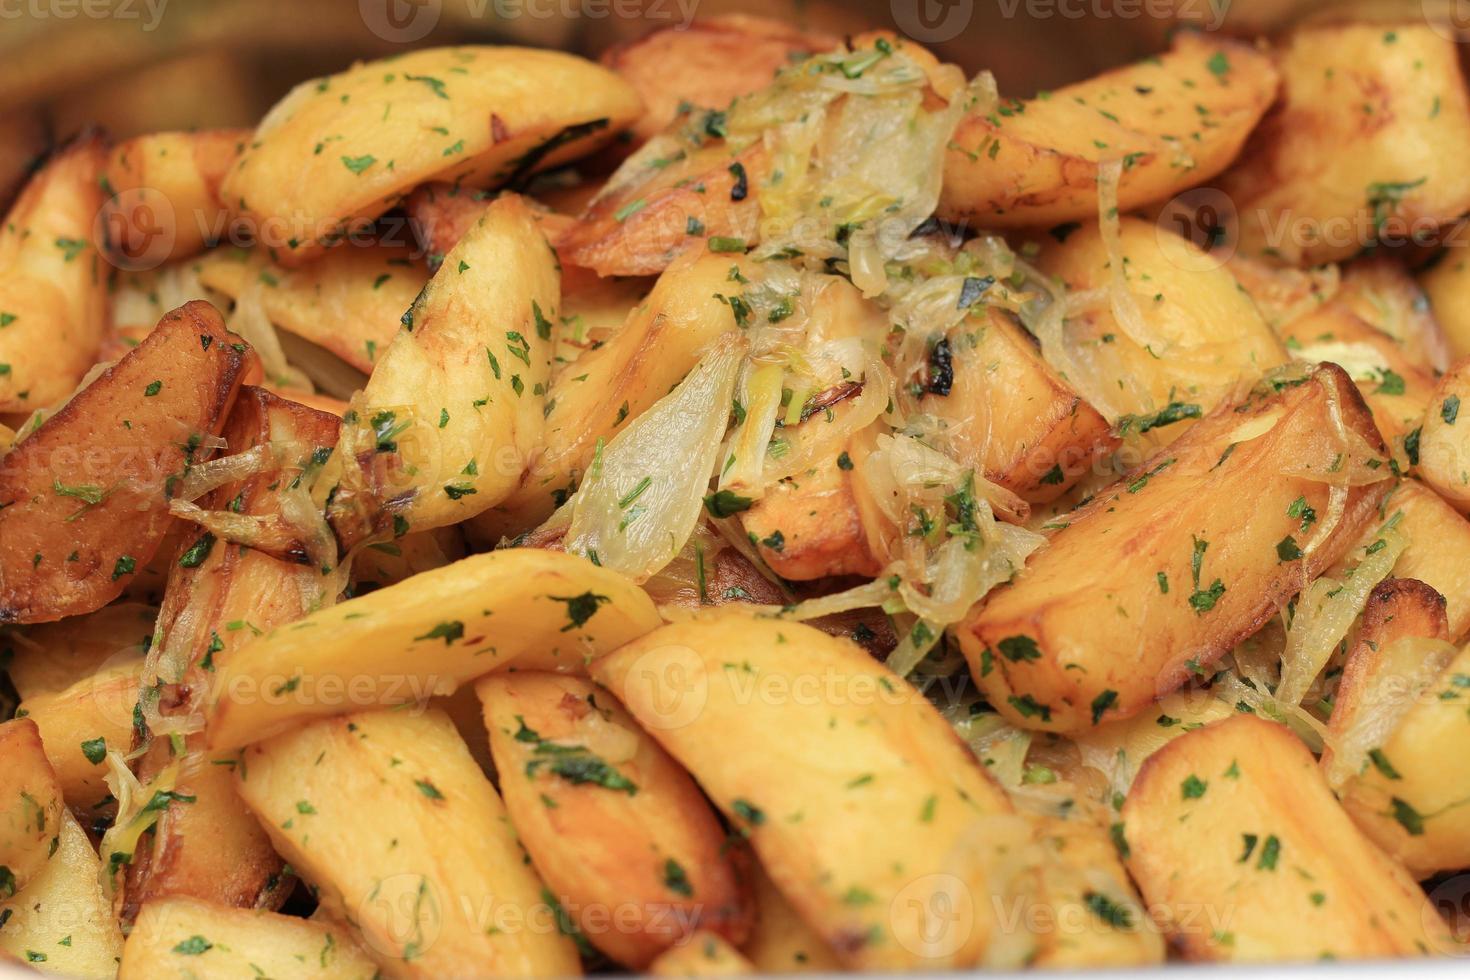 Baked Potato photo